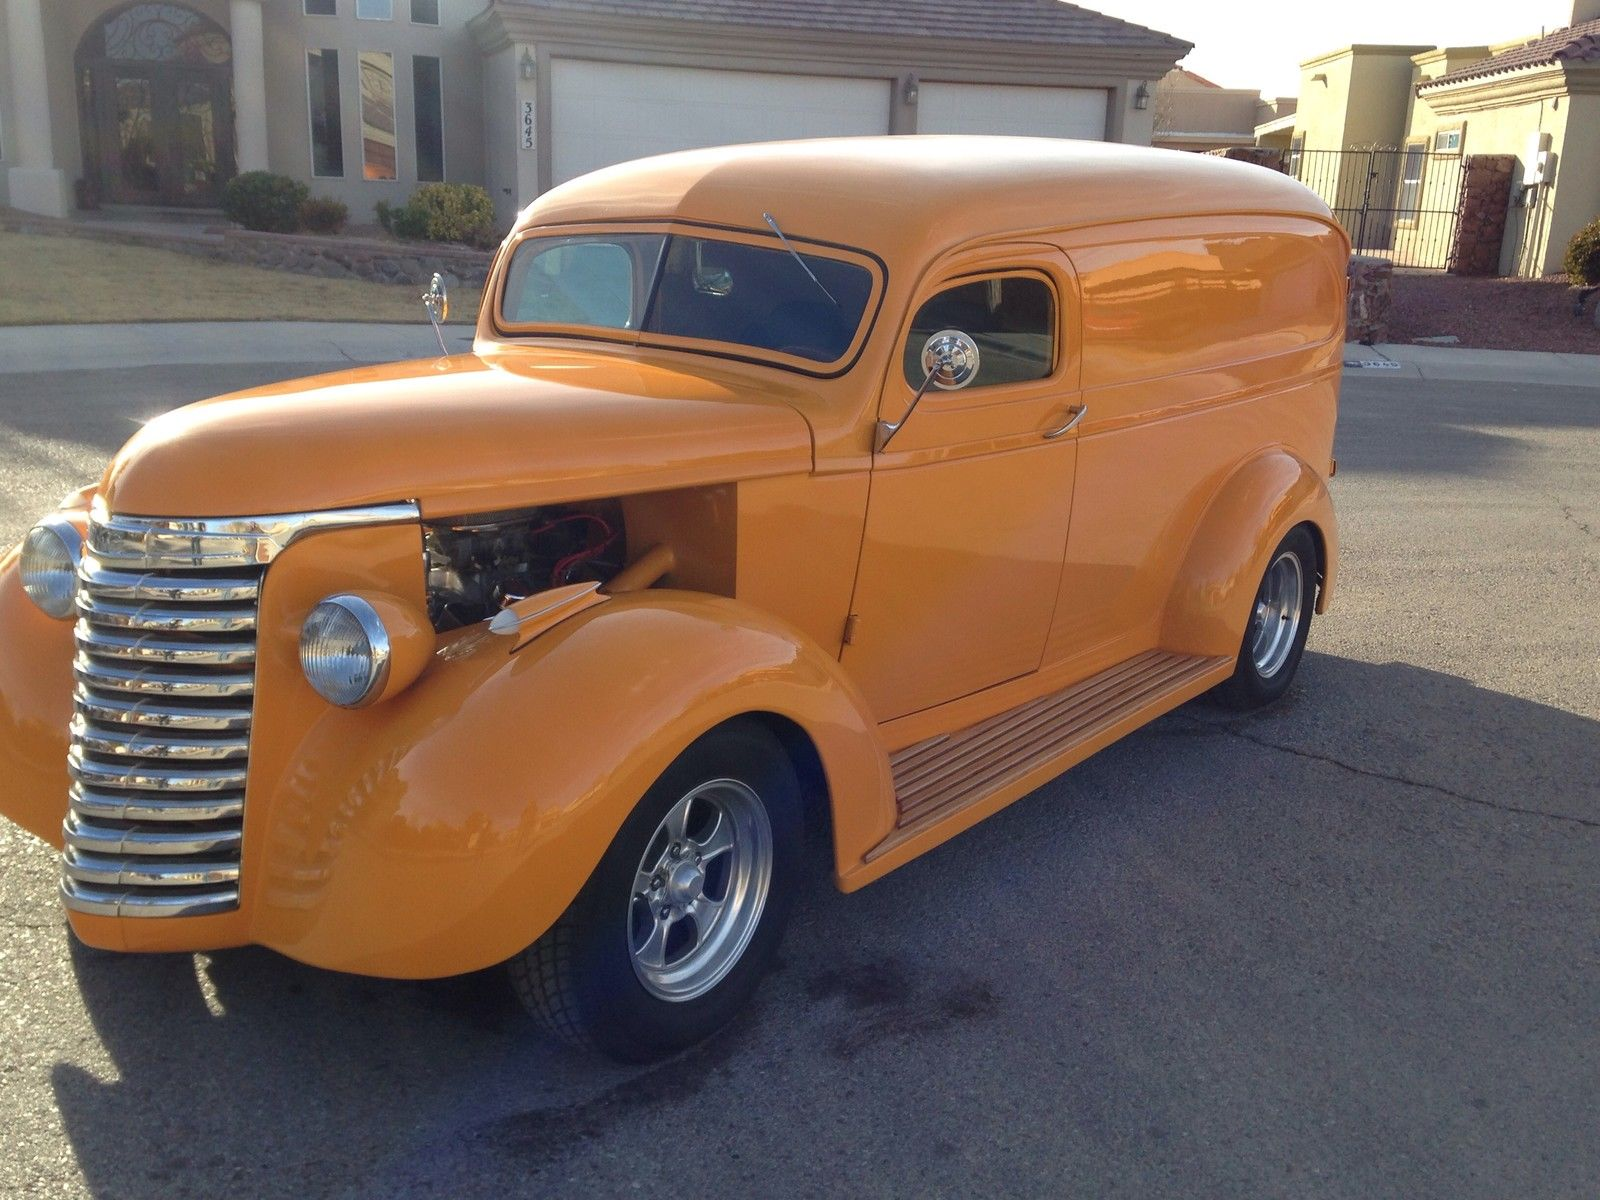 Hot rod, chopped, panel, rat rod, shop truck, panel van for sale ...